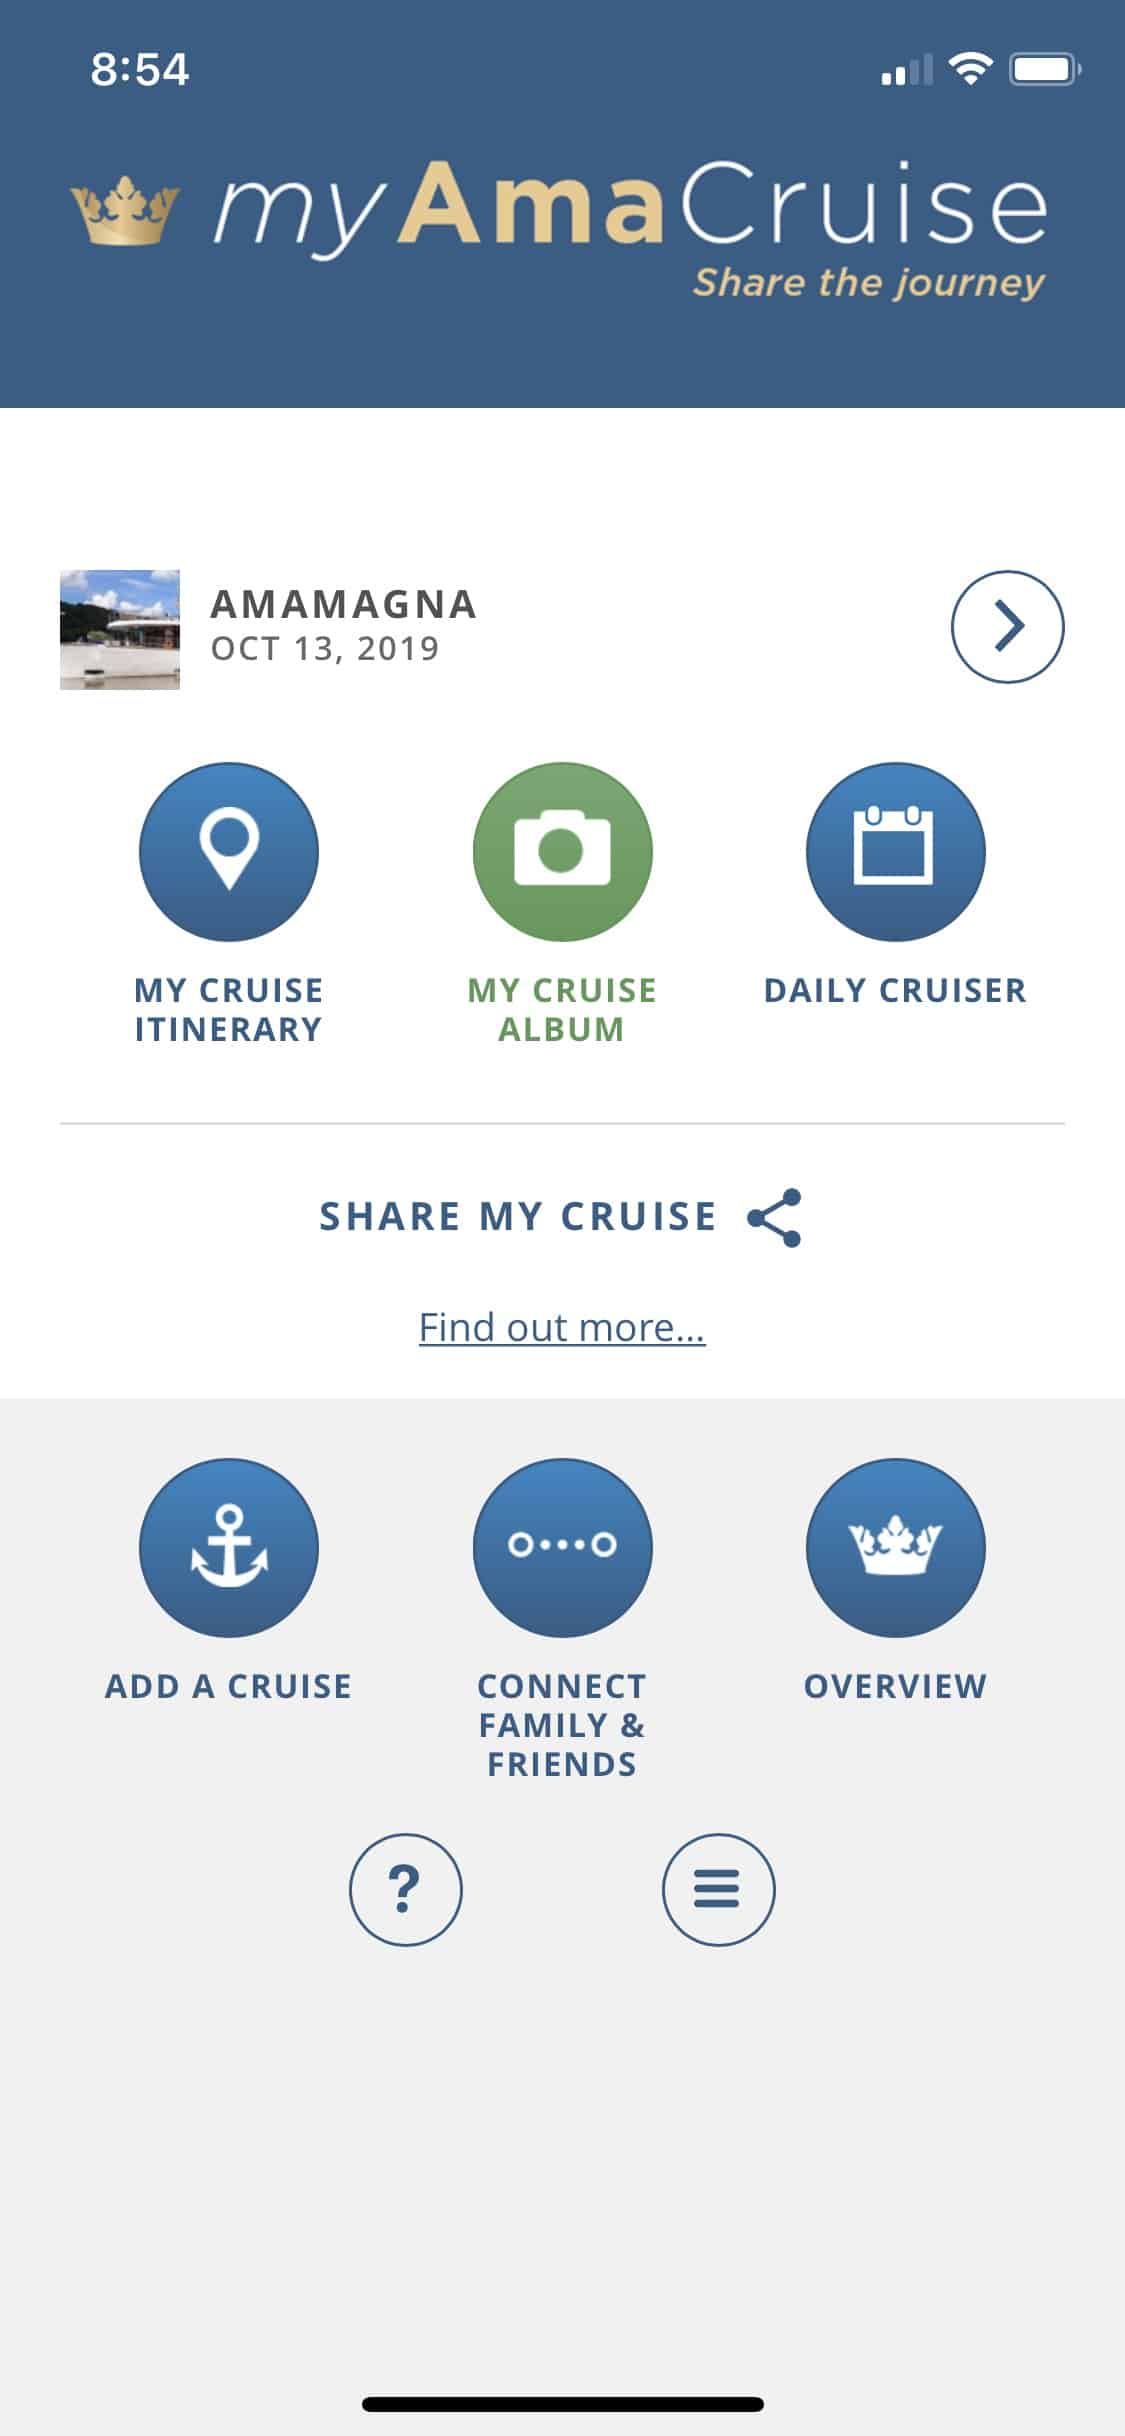 my amacruise app